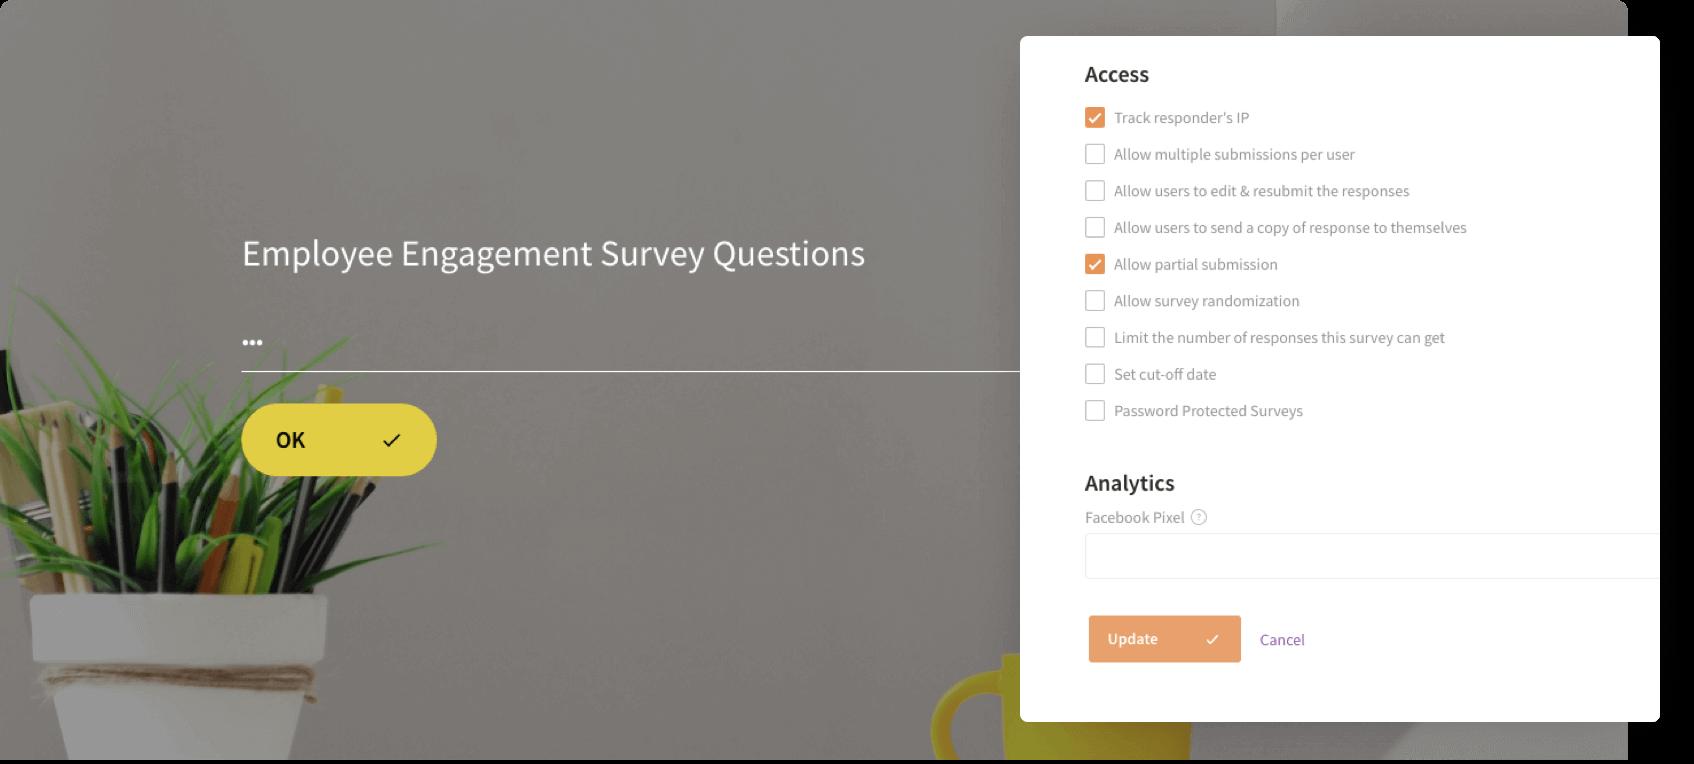 Secure your online surveys with advanced protection techniques.